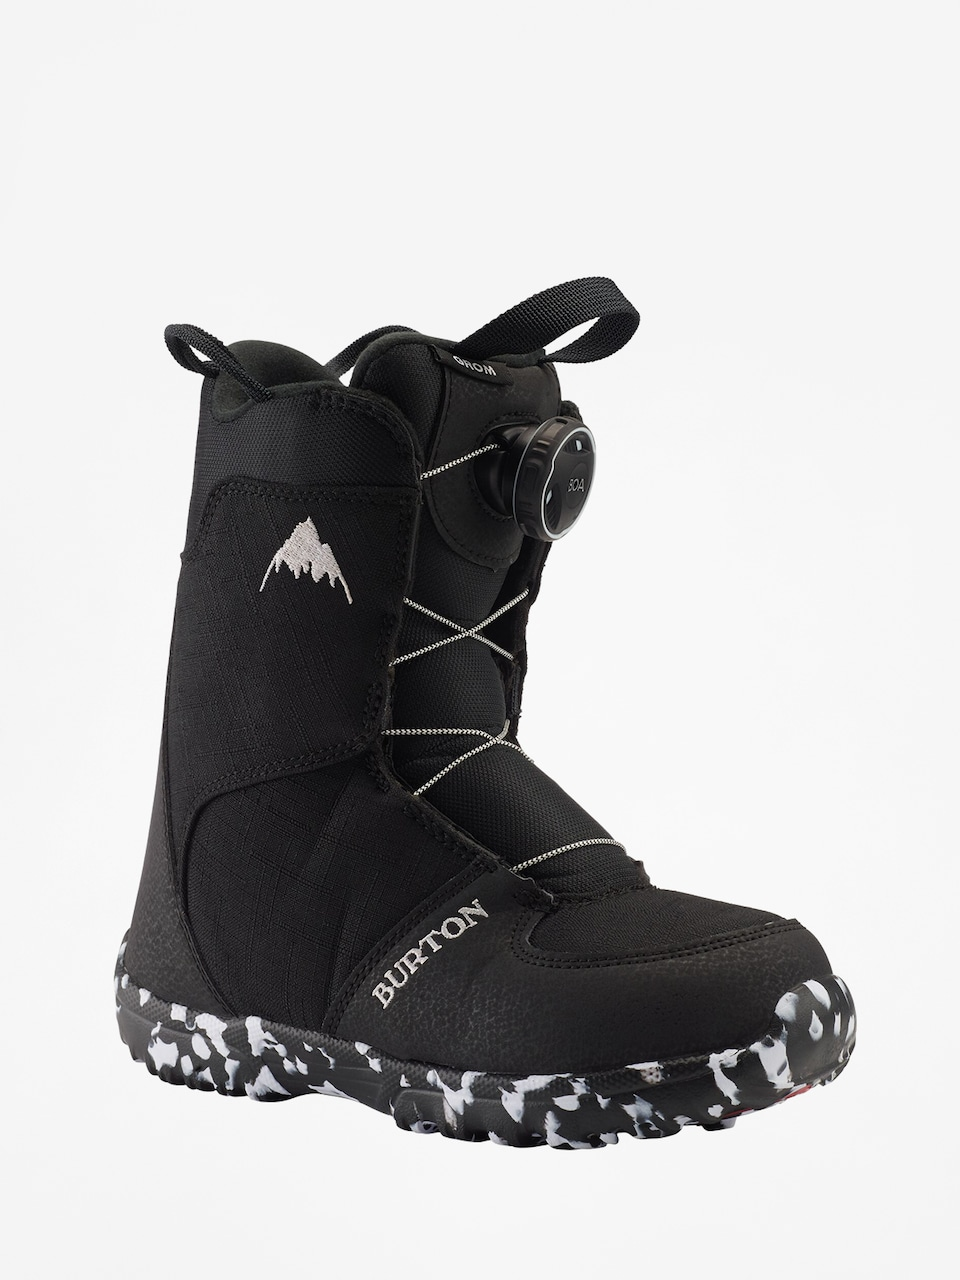 Buty Snowboardowe Burton Grom Boa Black